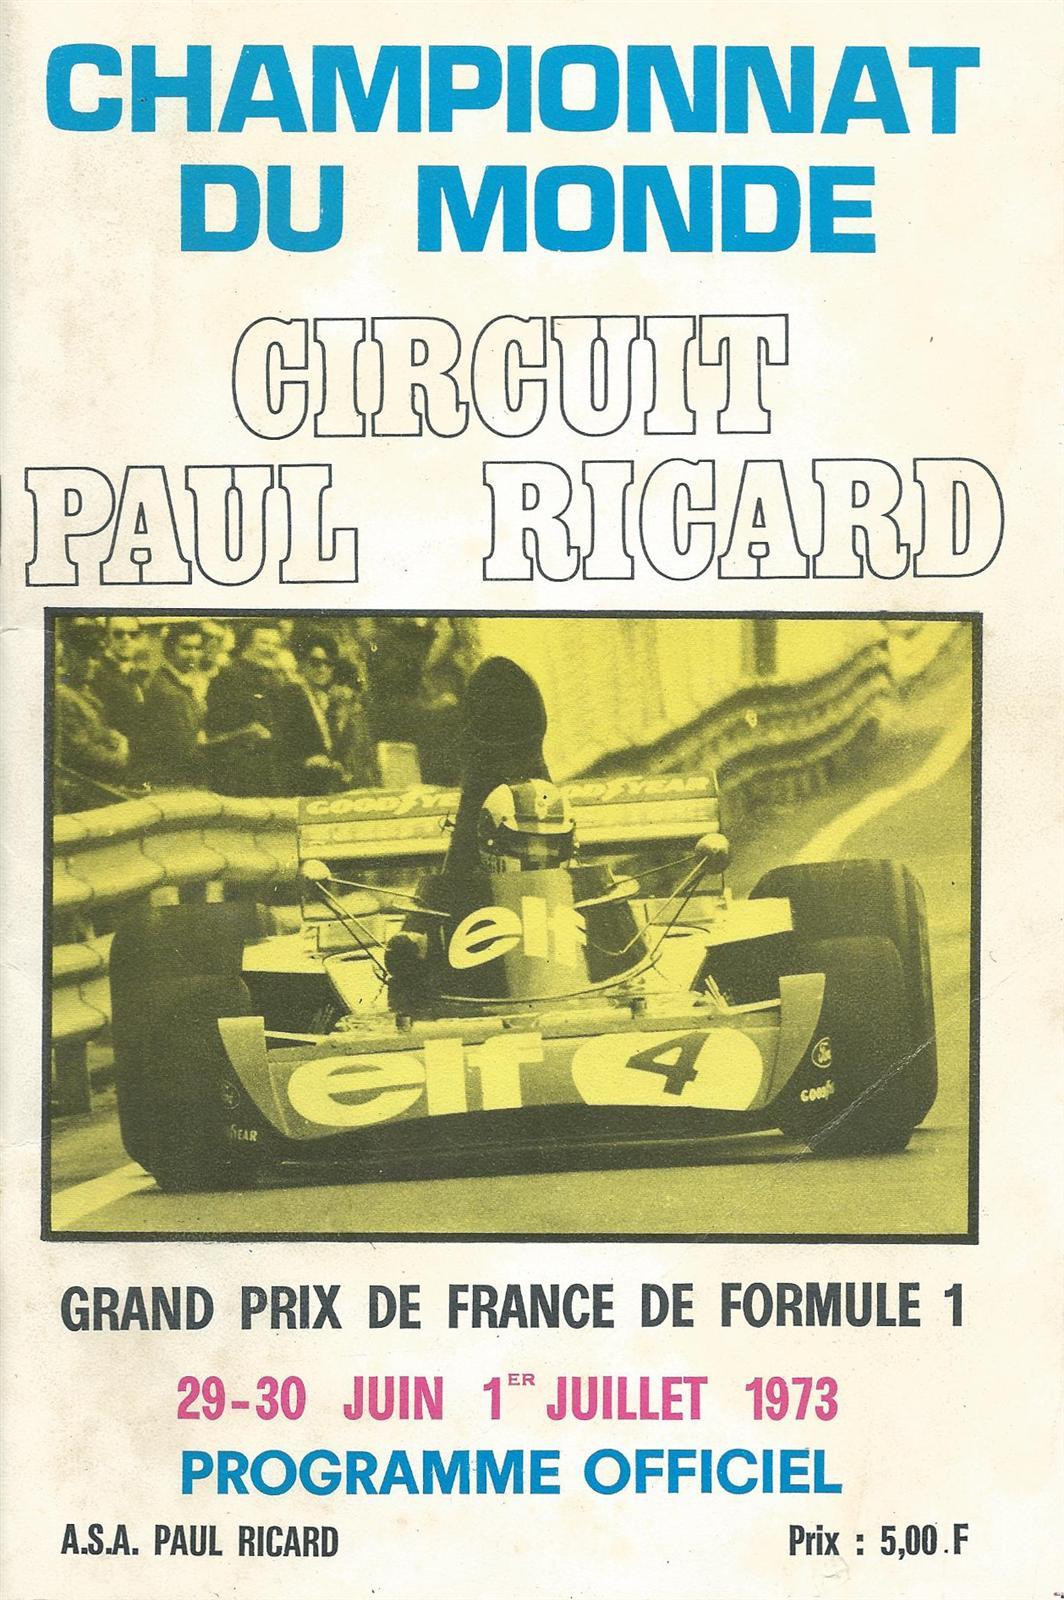 1973 formula 1 world championship programmes the motor racing programme covers project. Black Bedroom Furniture Sets. Home Design Ideas